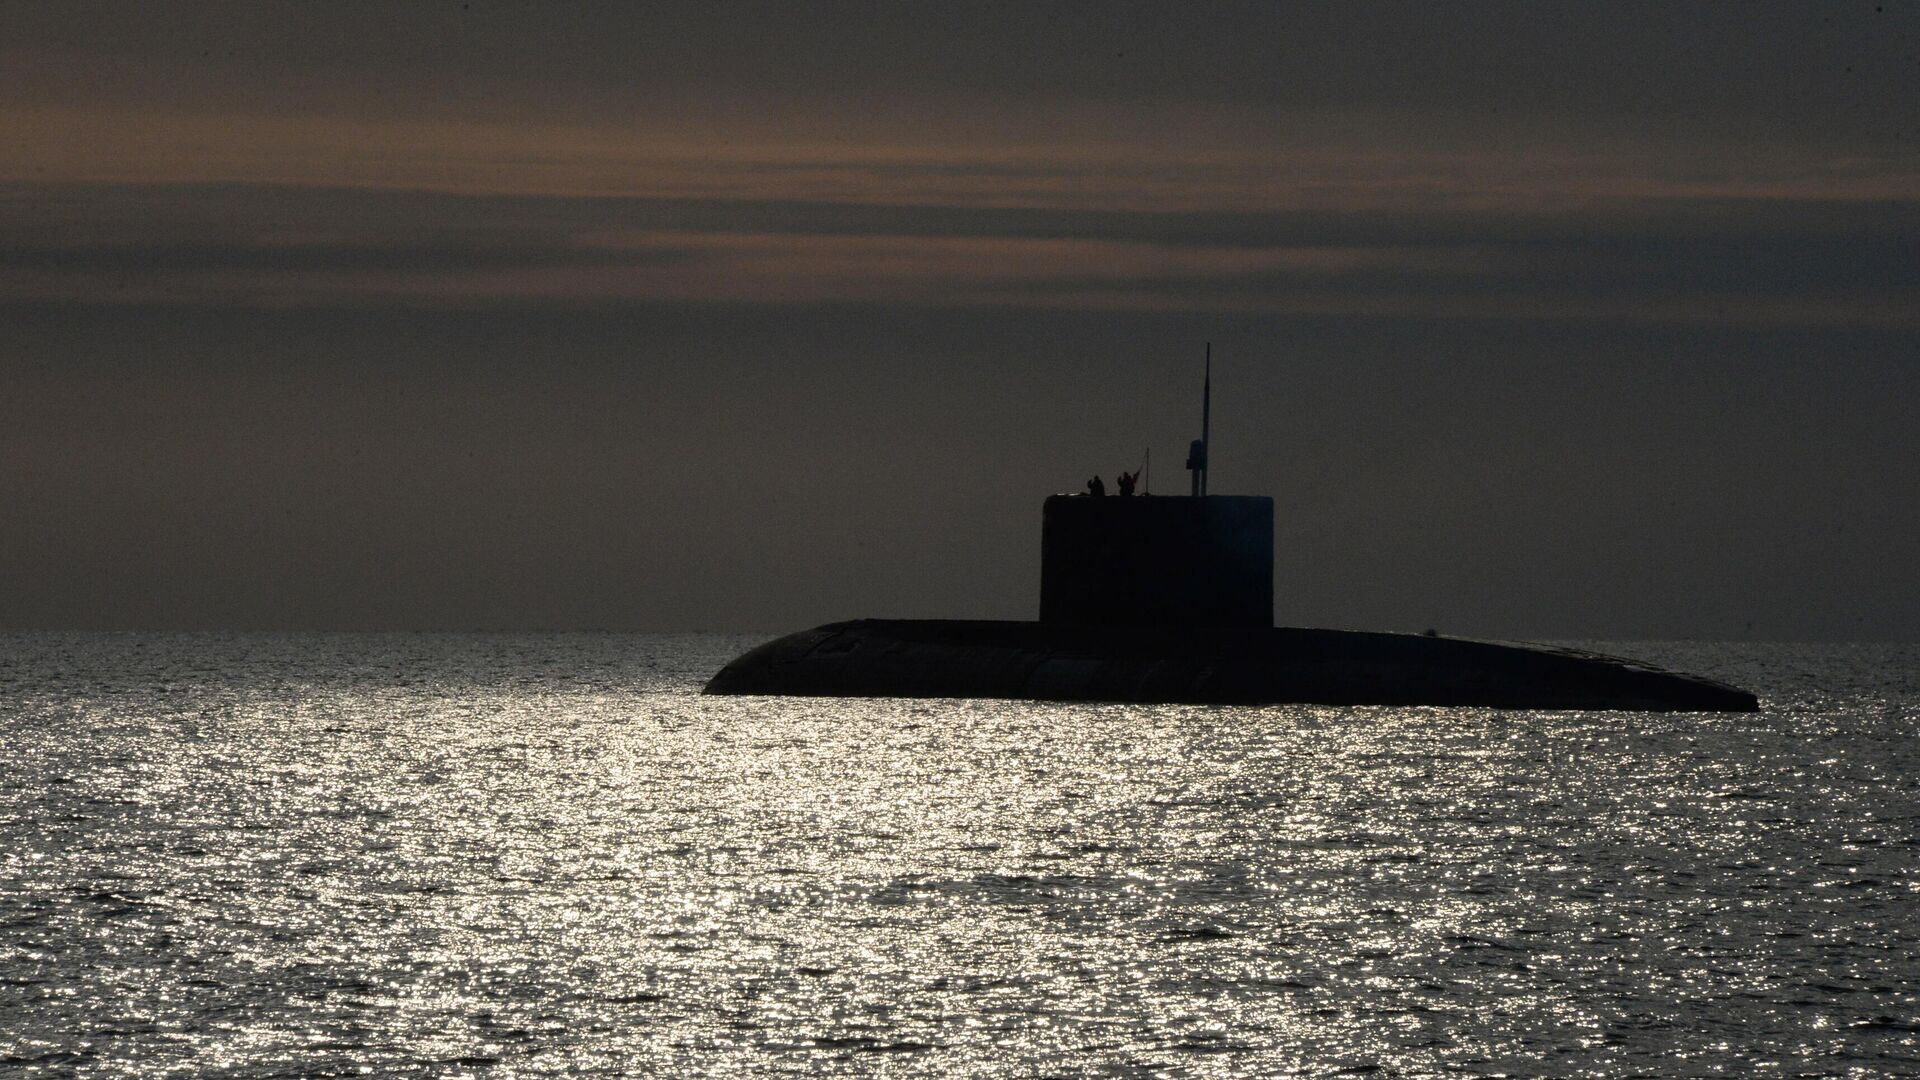 Подводная лодка класса Варшавянка - РИА Новости, 1920, 25.08.2020